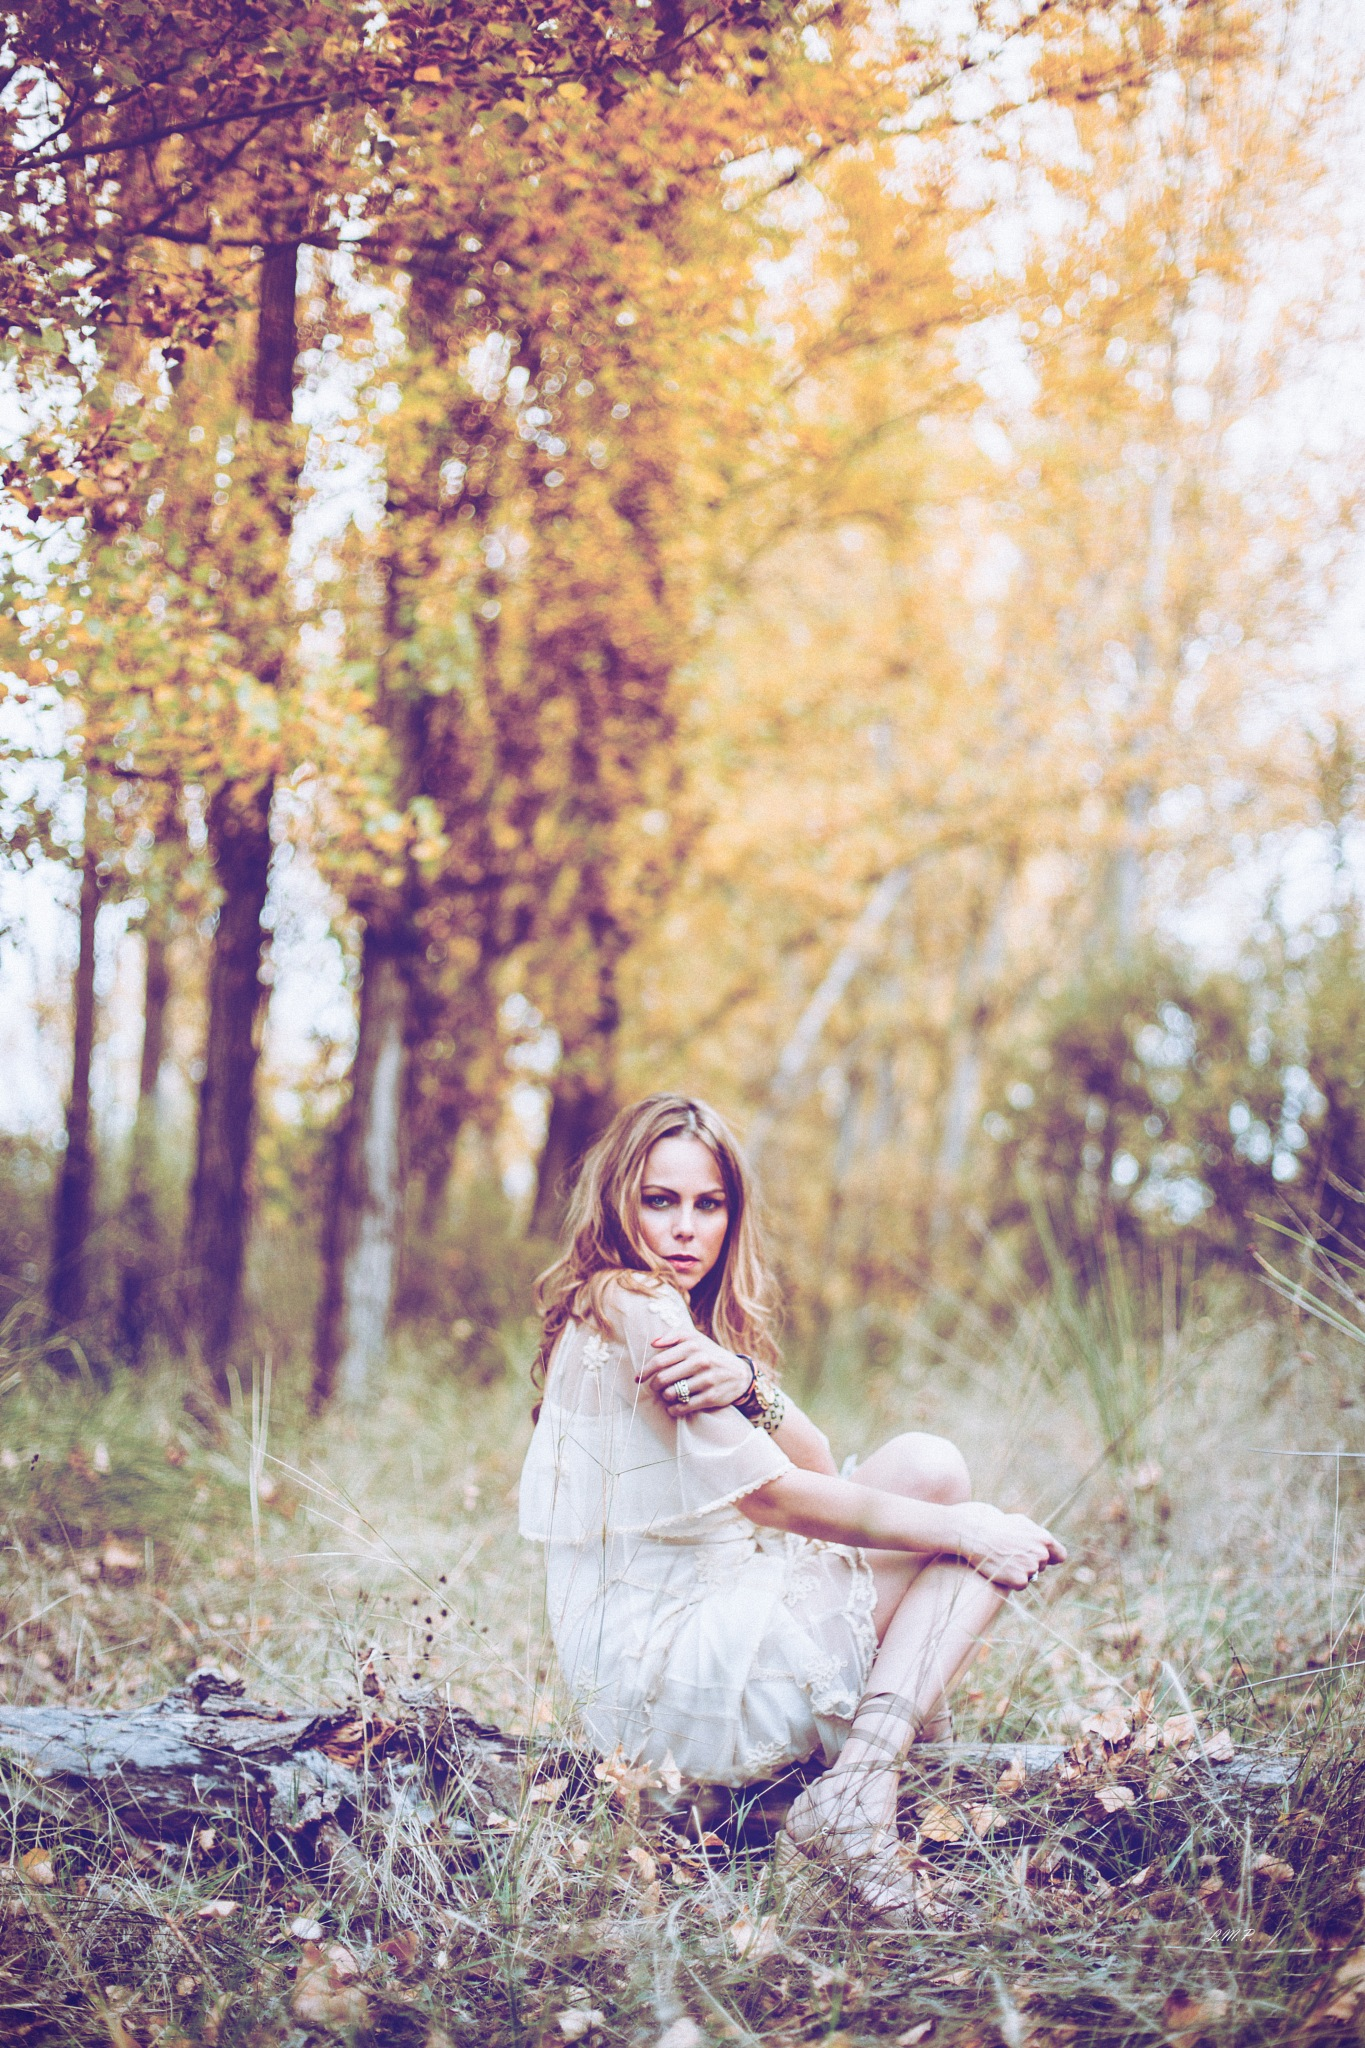 The fall, the warm beauty by lumario79